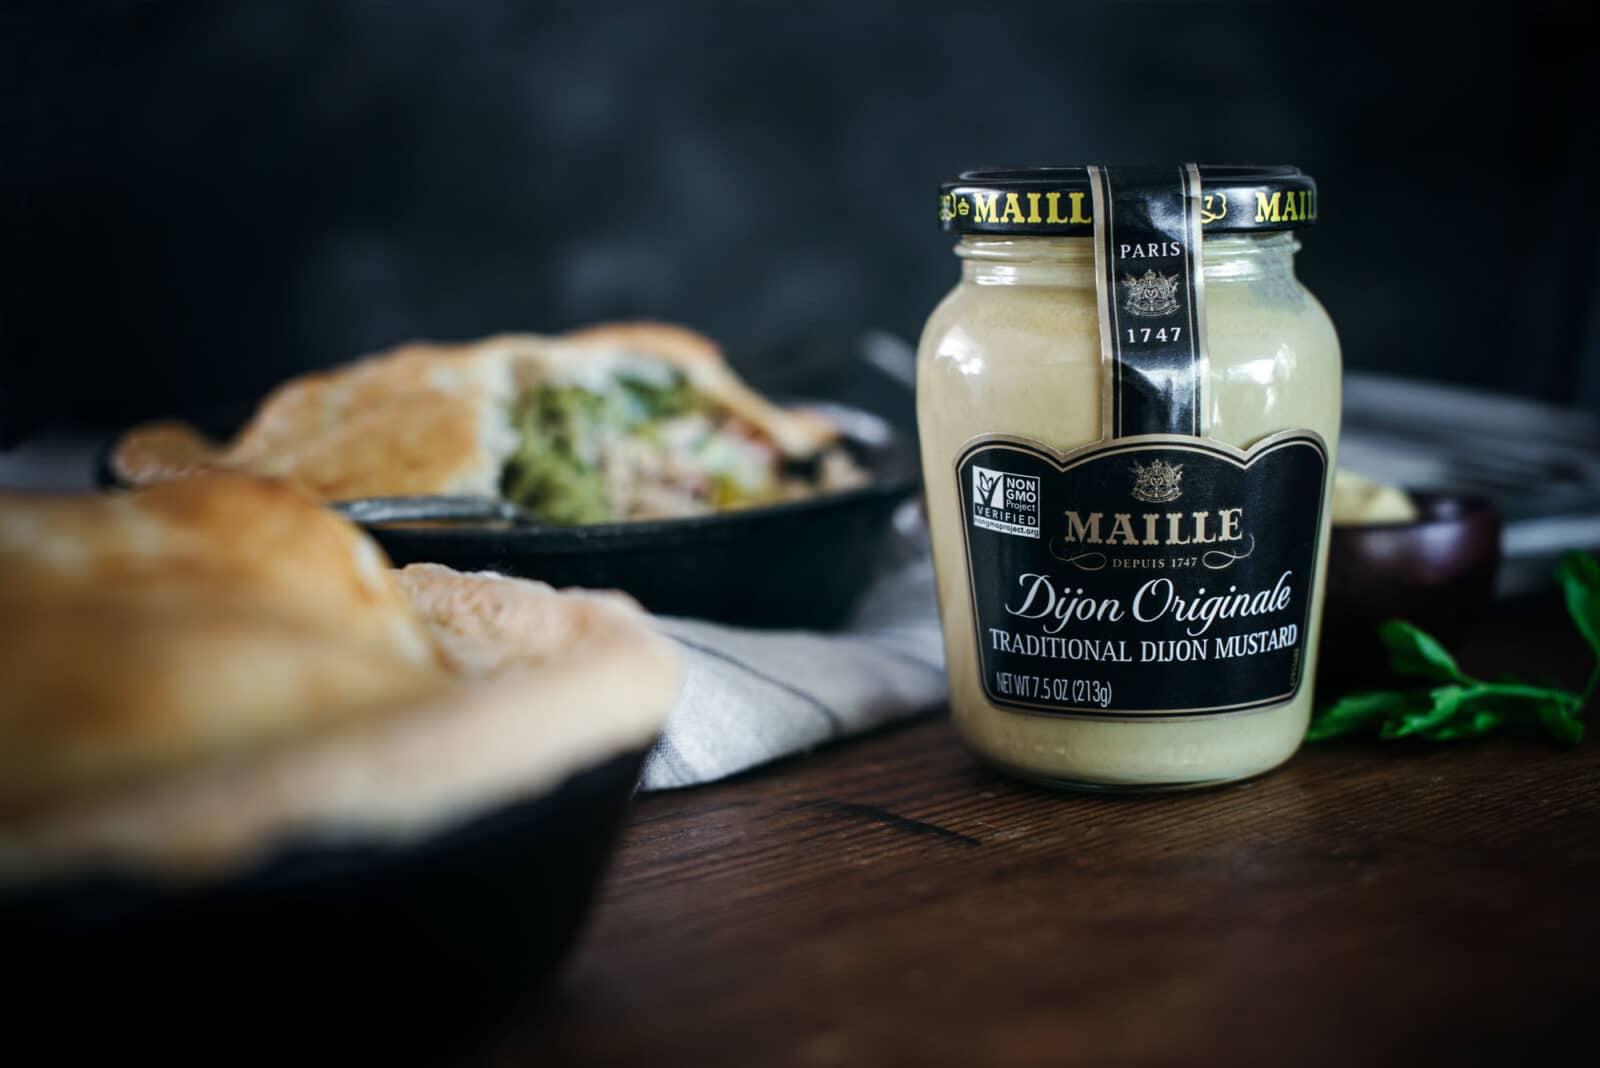 Maille Djon Originale Mustard